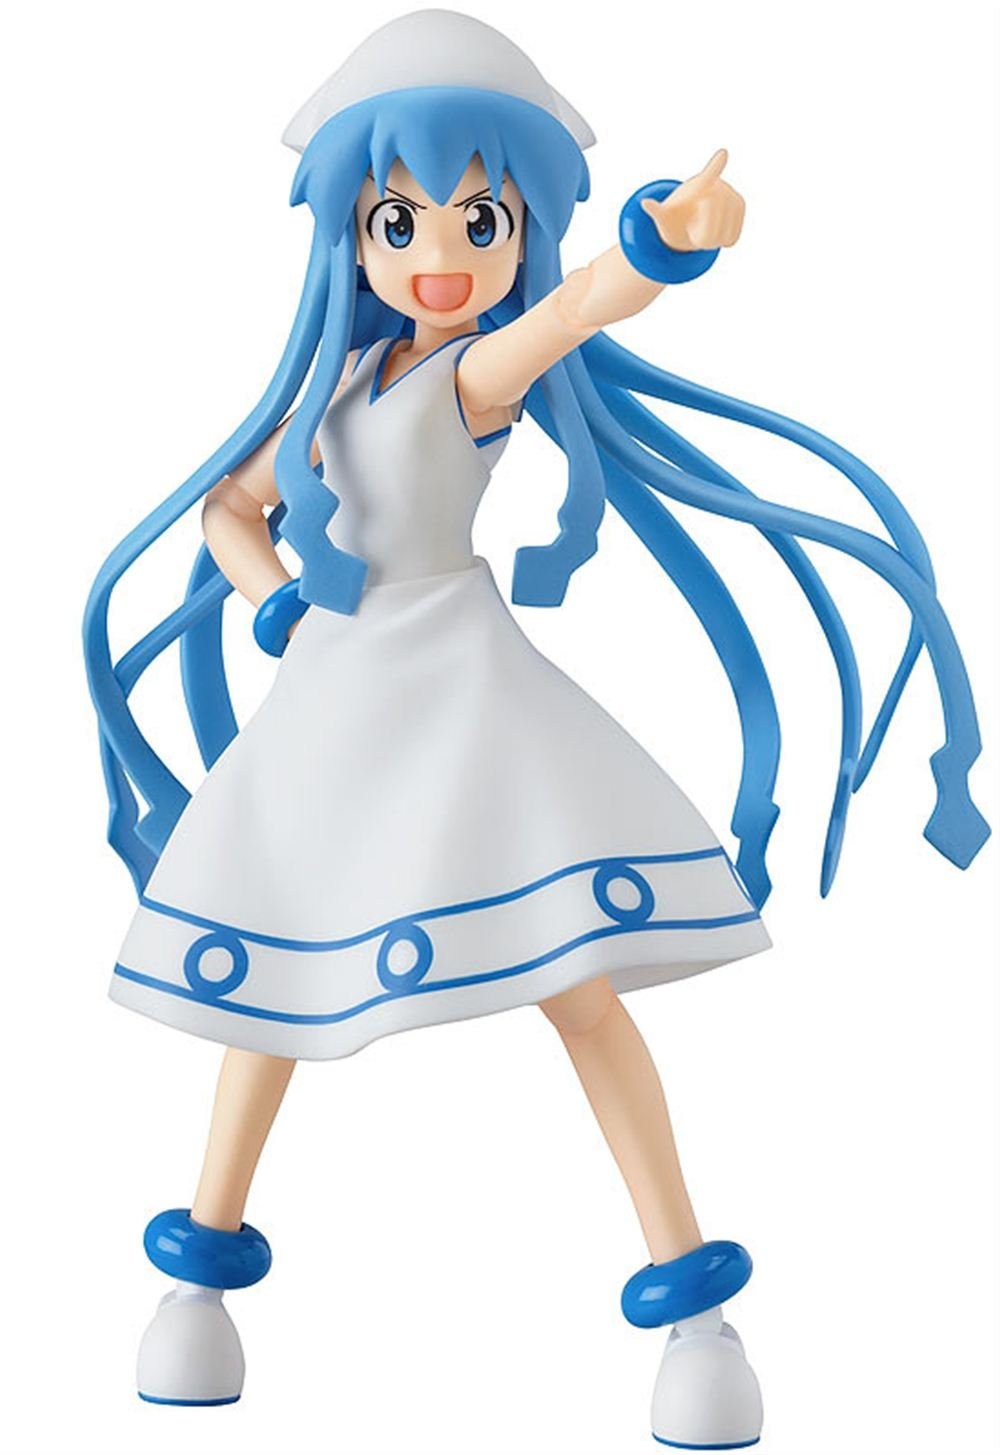 Max Factory Squid Girl Ika Musume Figma Action Figure